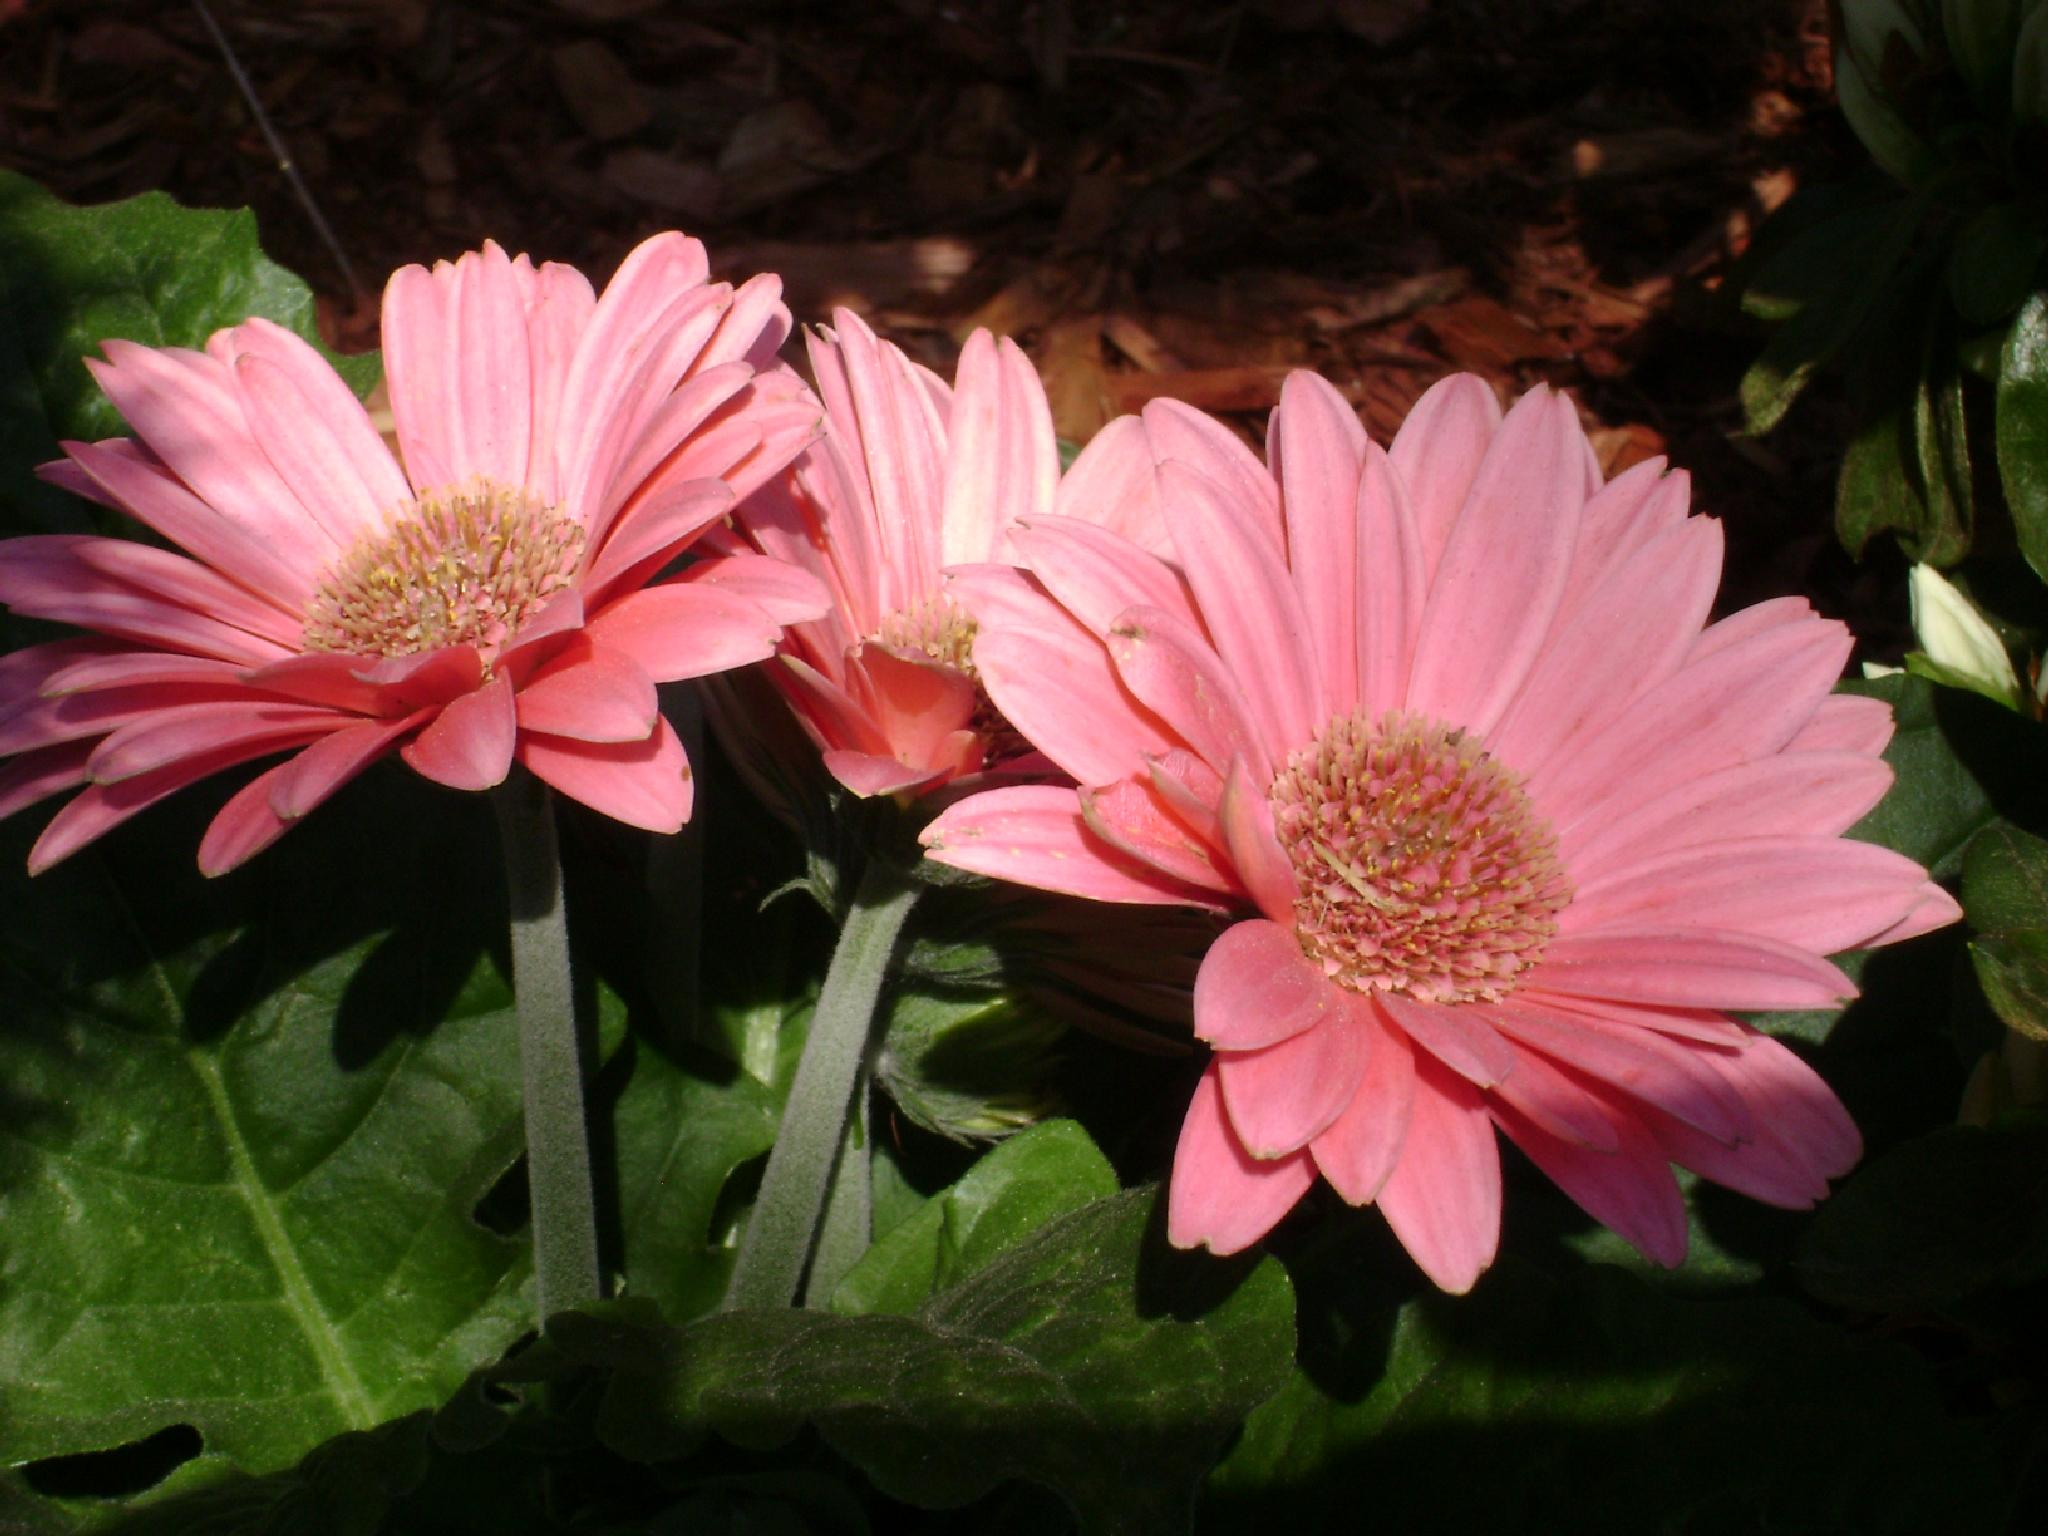 pink shasta daisies by Diana Marenfeld